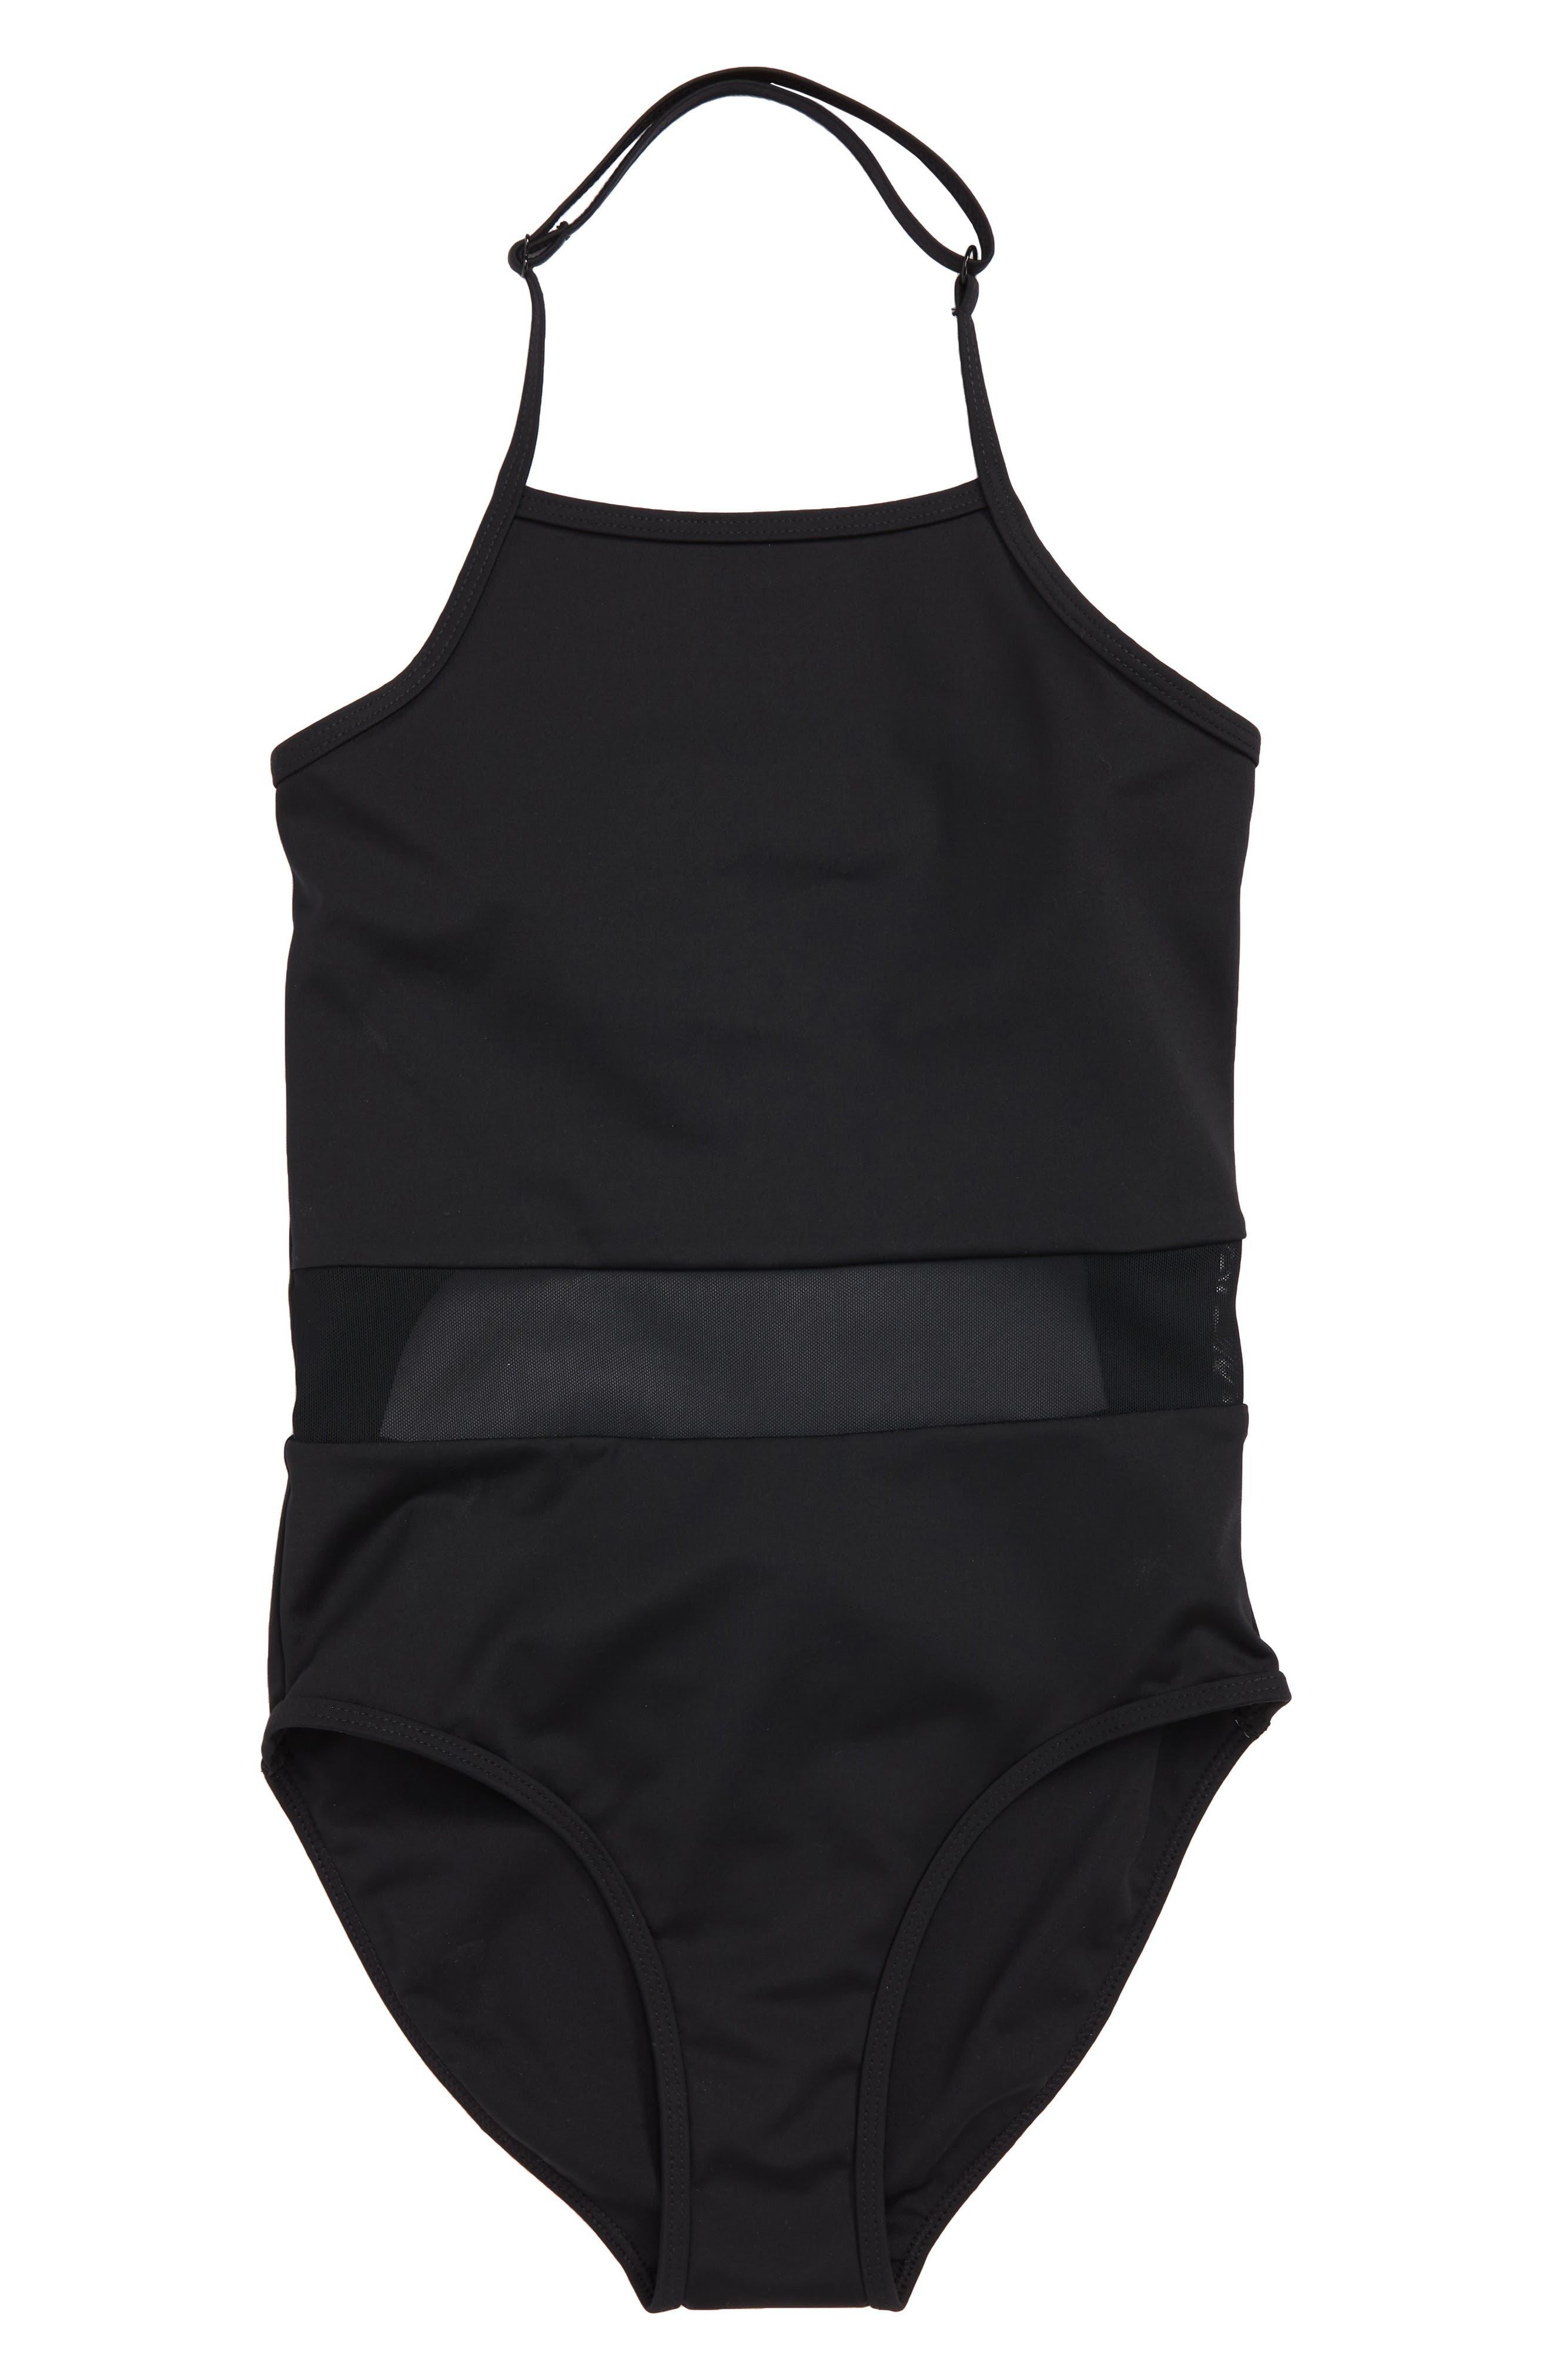 Horizon Mesh Inset One-Piece Swimsuit,                             Main thumbnail 1, color,                             Black